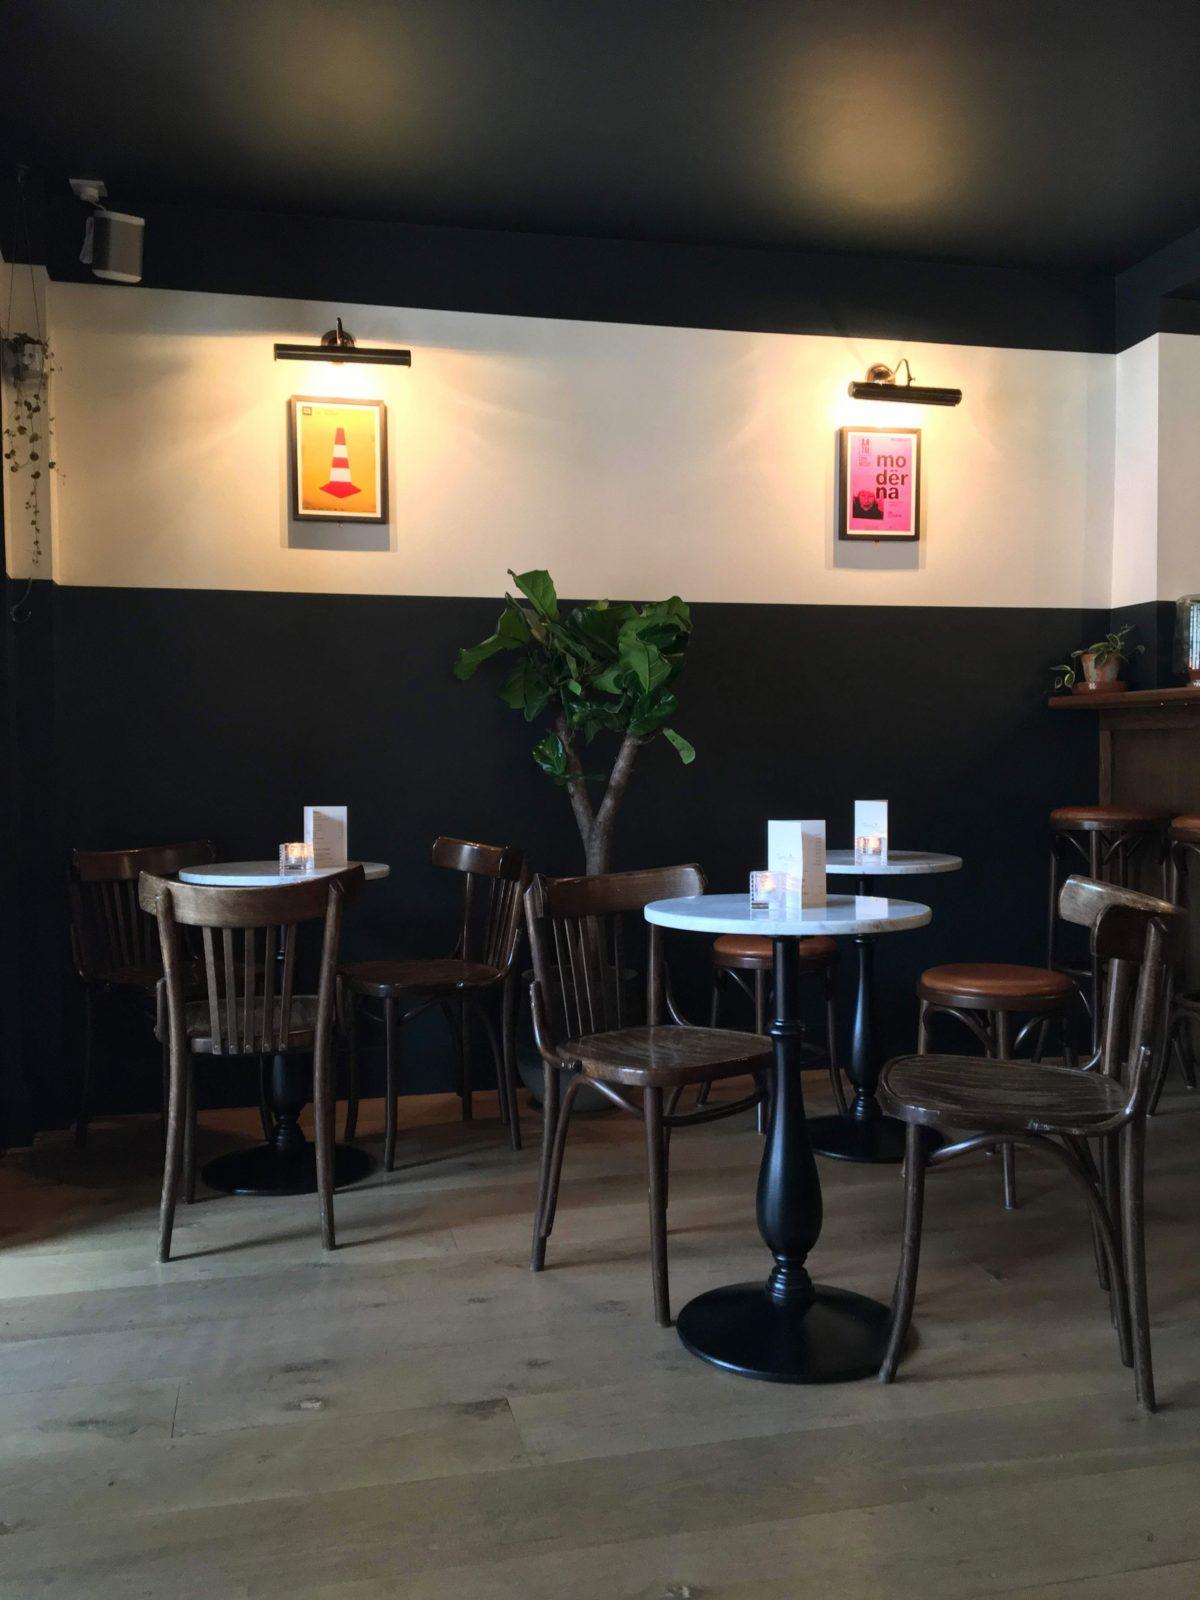 Terruno bar Oxford review | image credit Bitten Oxford